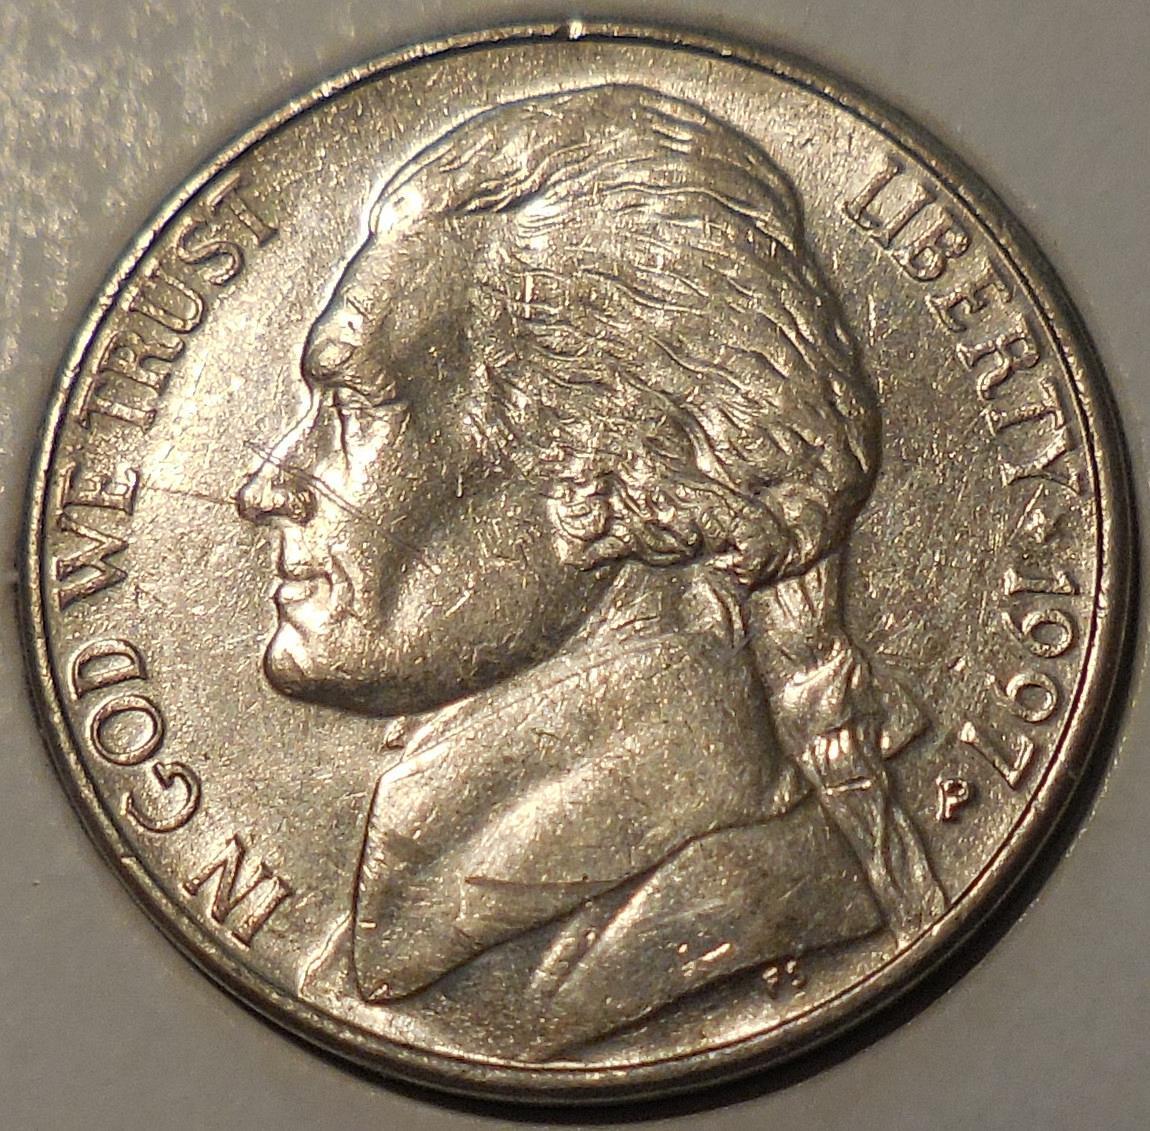 1997-P Jefferson Nickel Spike Head Die Crack Error - for sale, buy